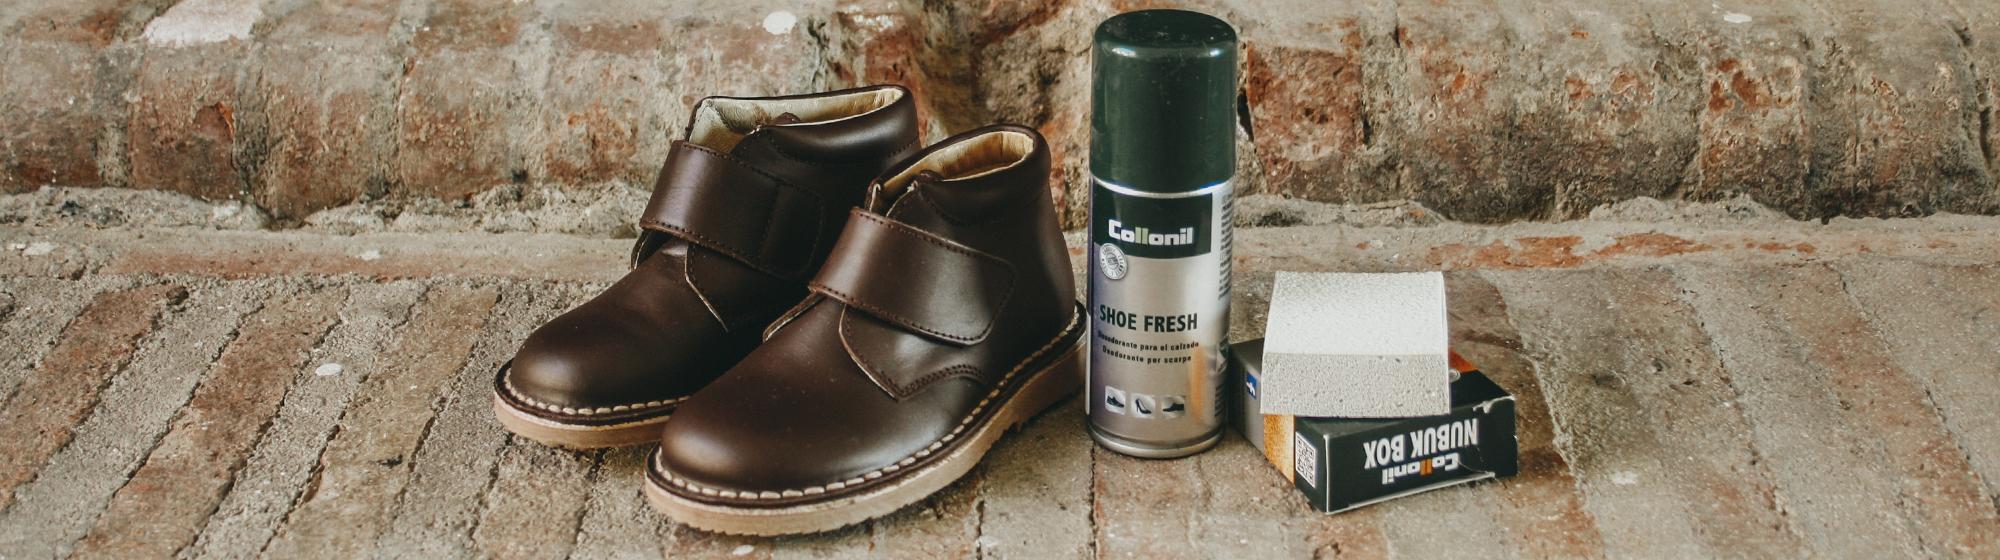 Para limpiar zapatos